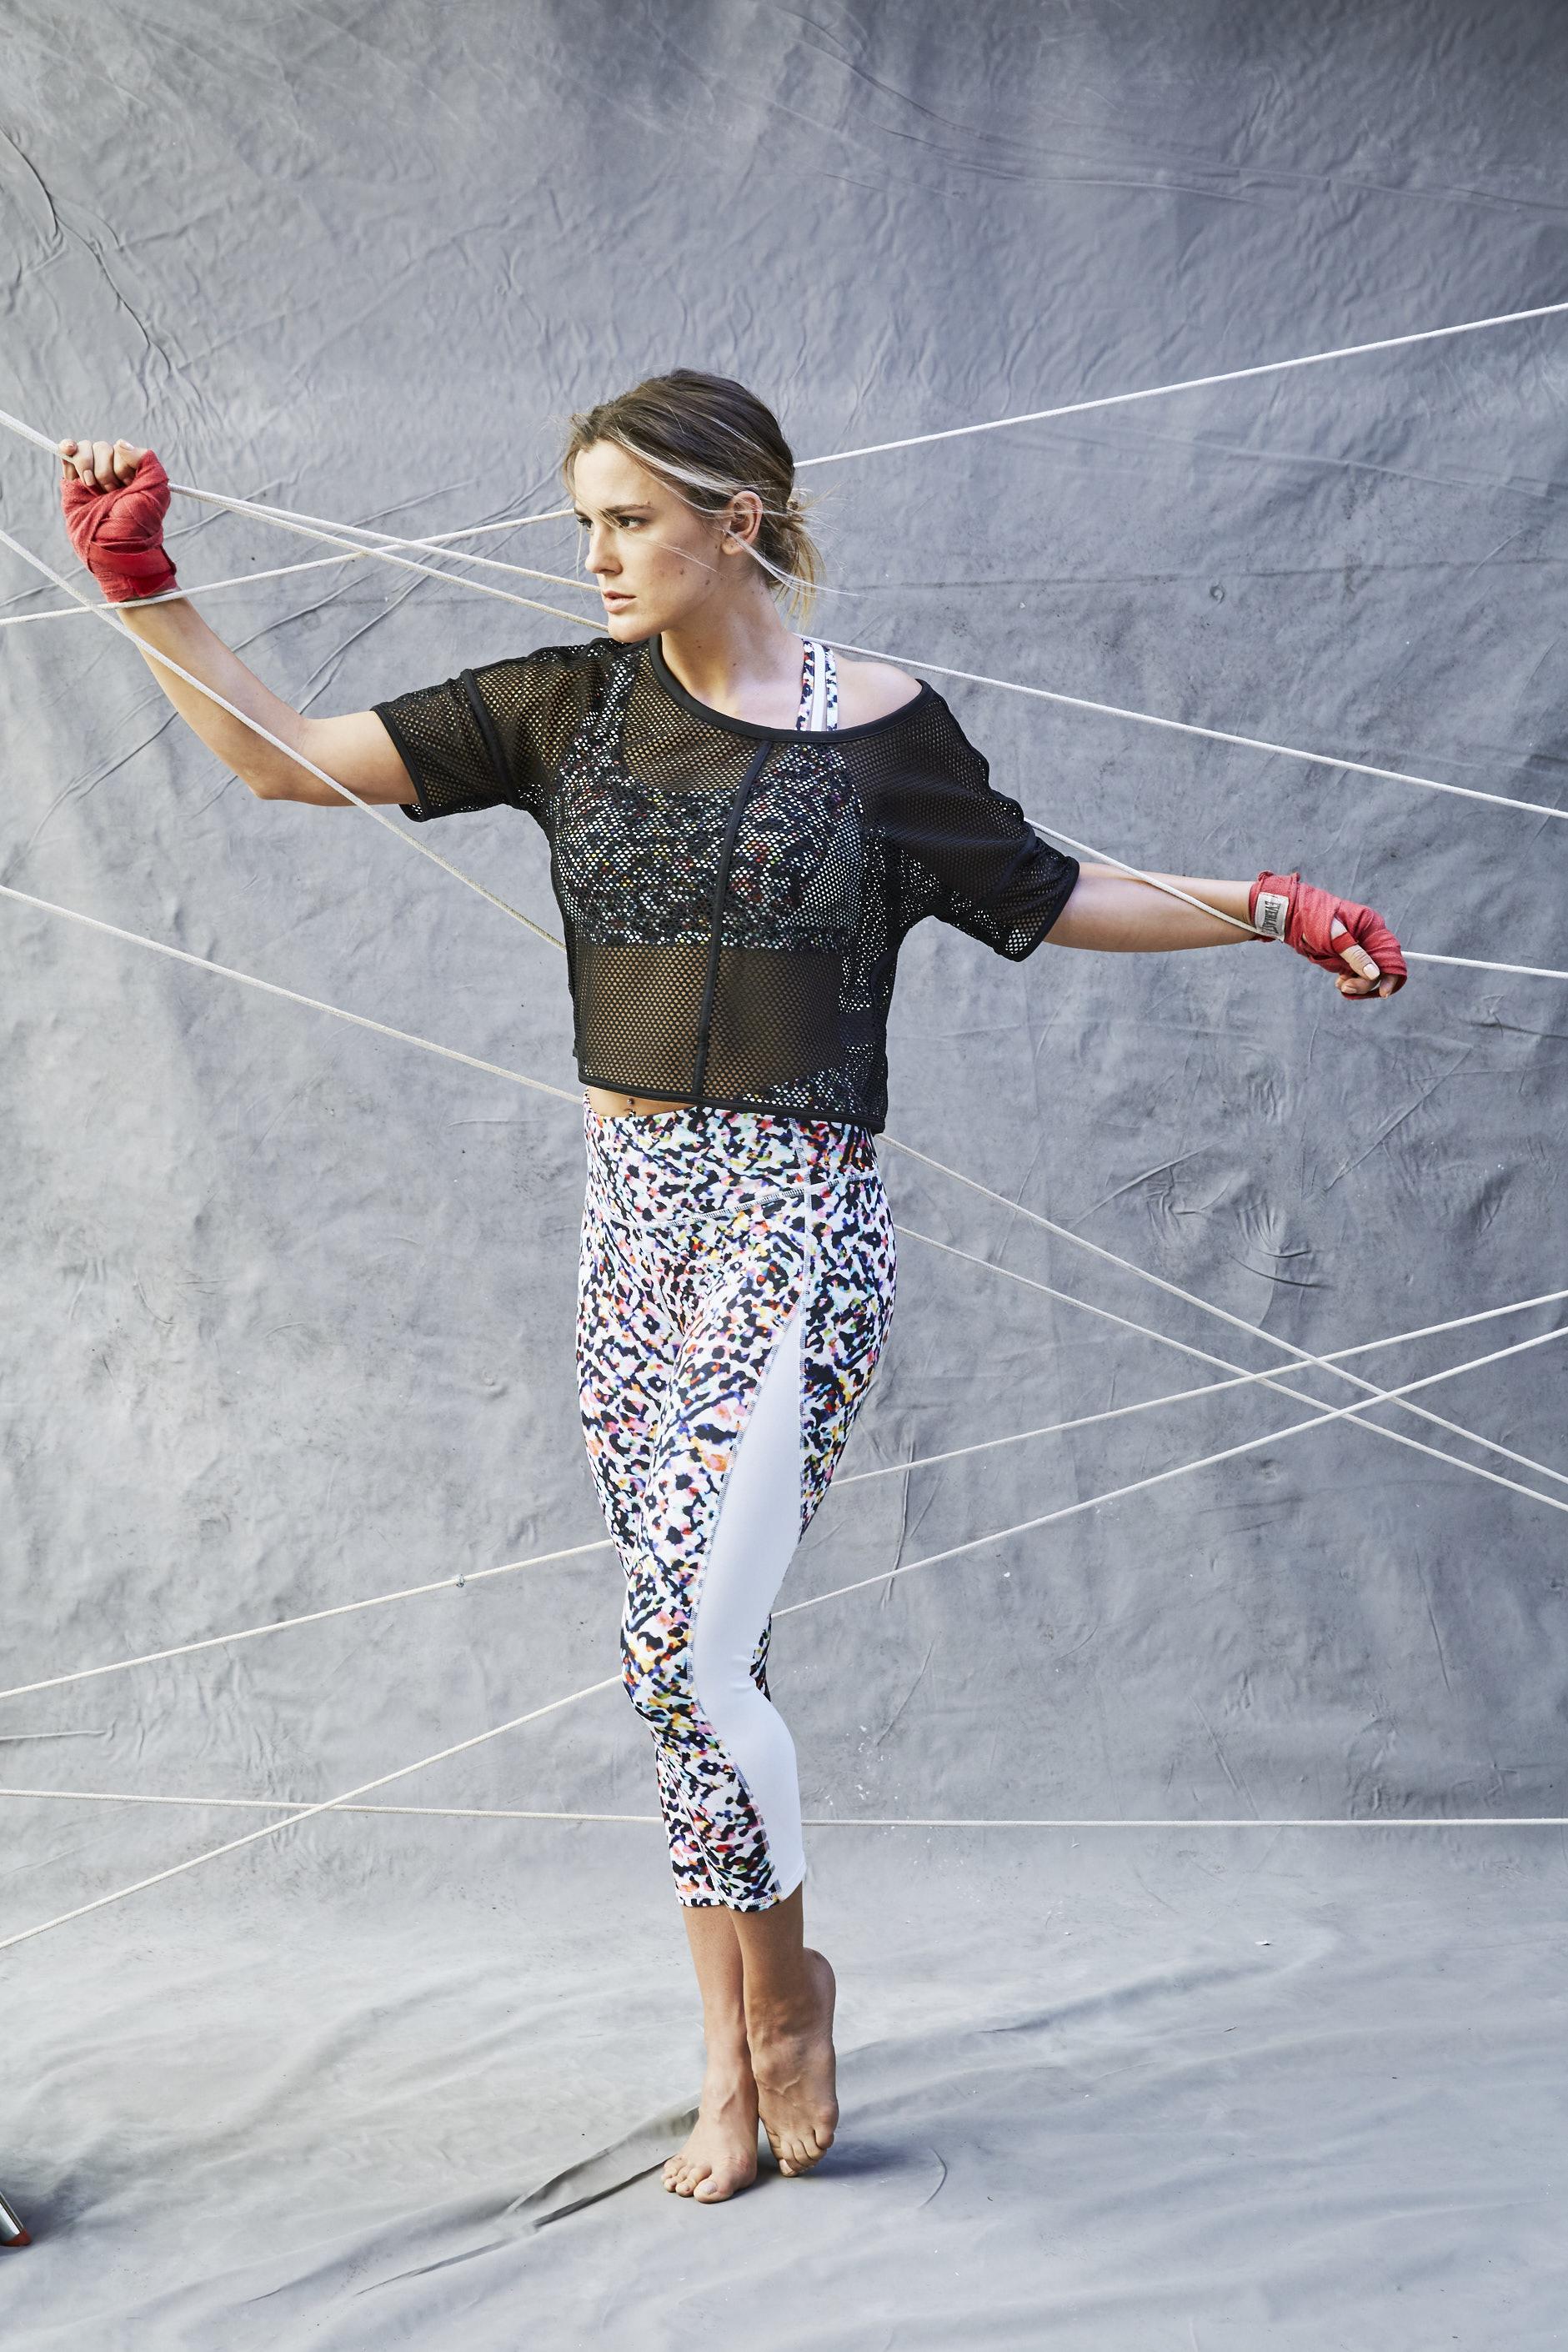 518_Outfit4_0765_AthleticTest_JulieBullock.jpg